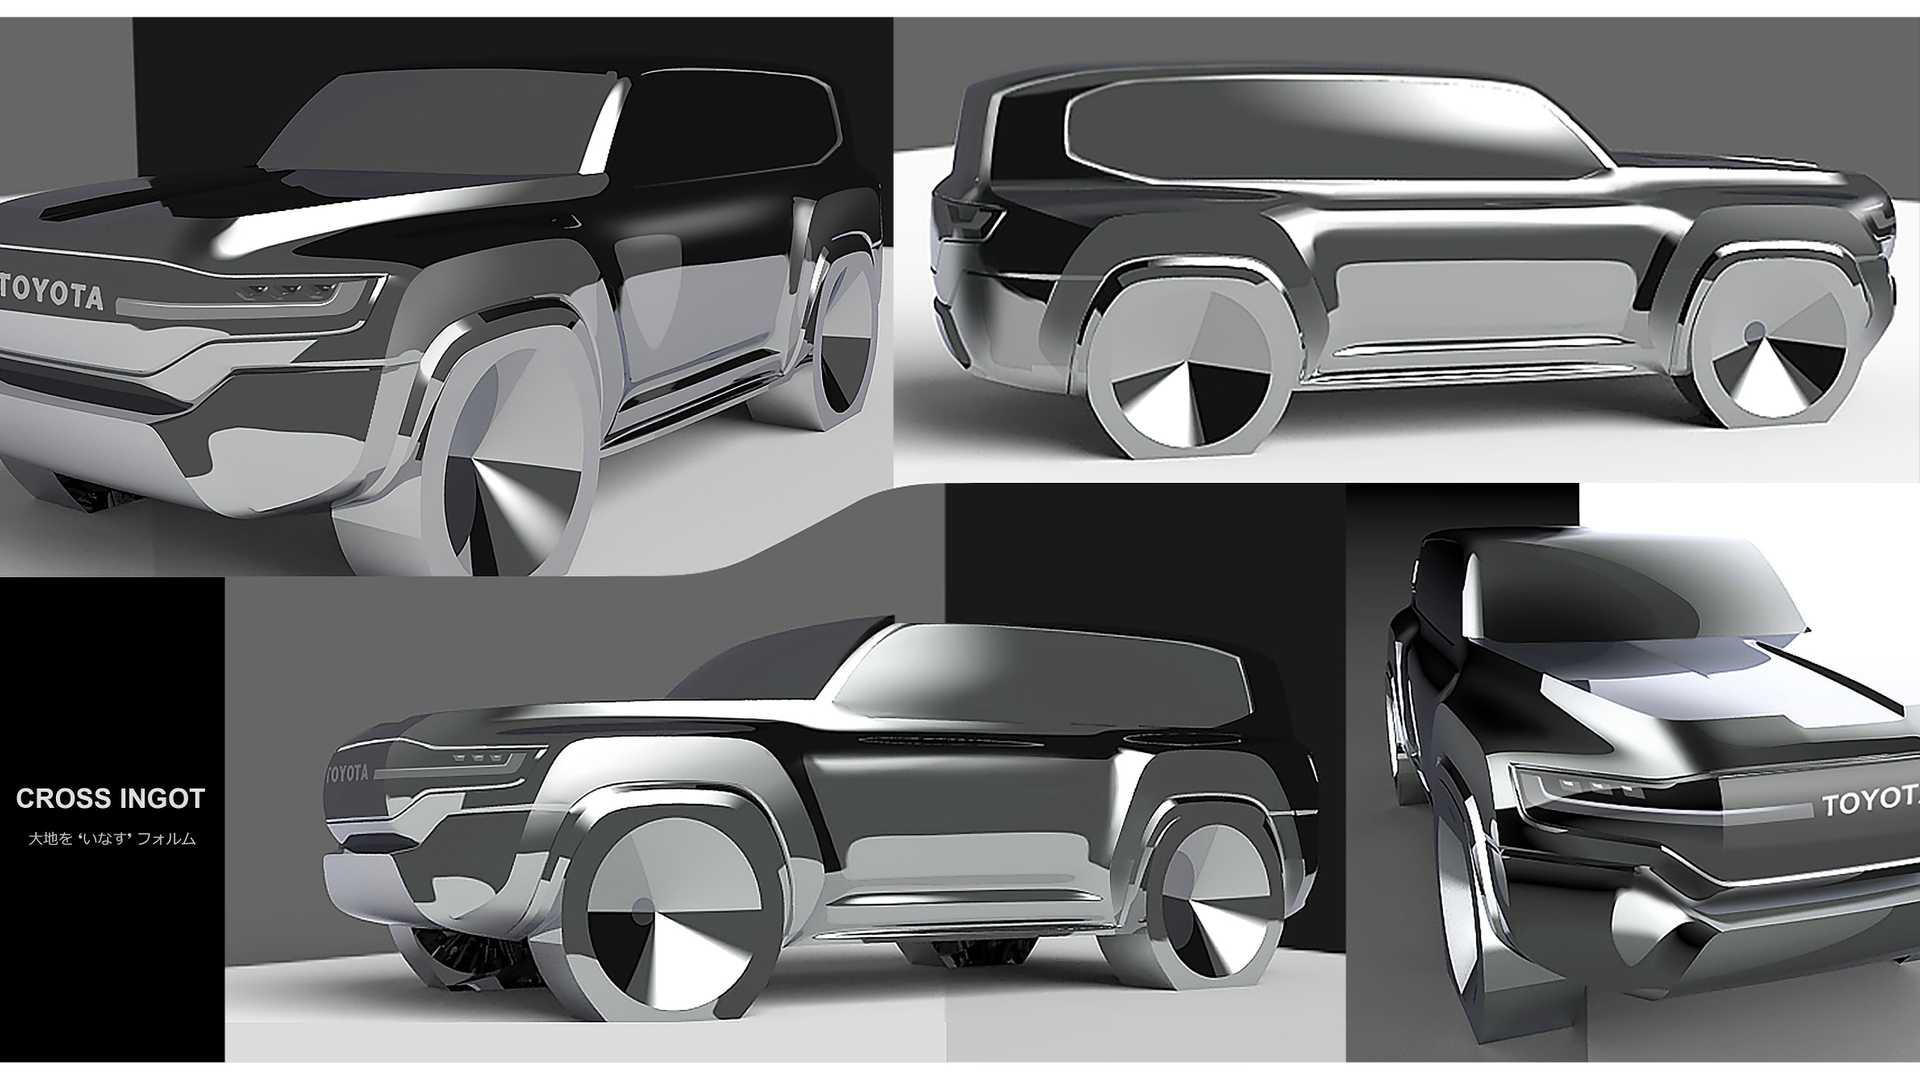 Toyota-Land-Cruiser-design-sketches-6